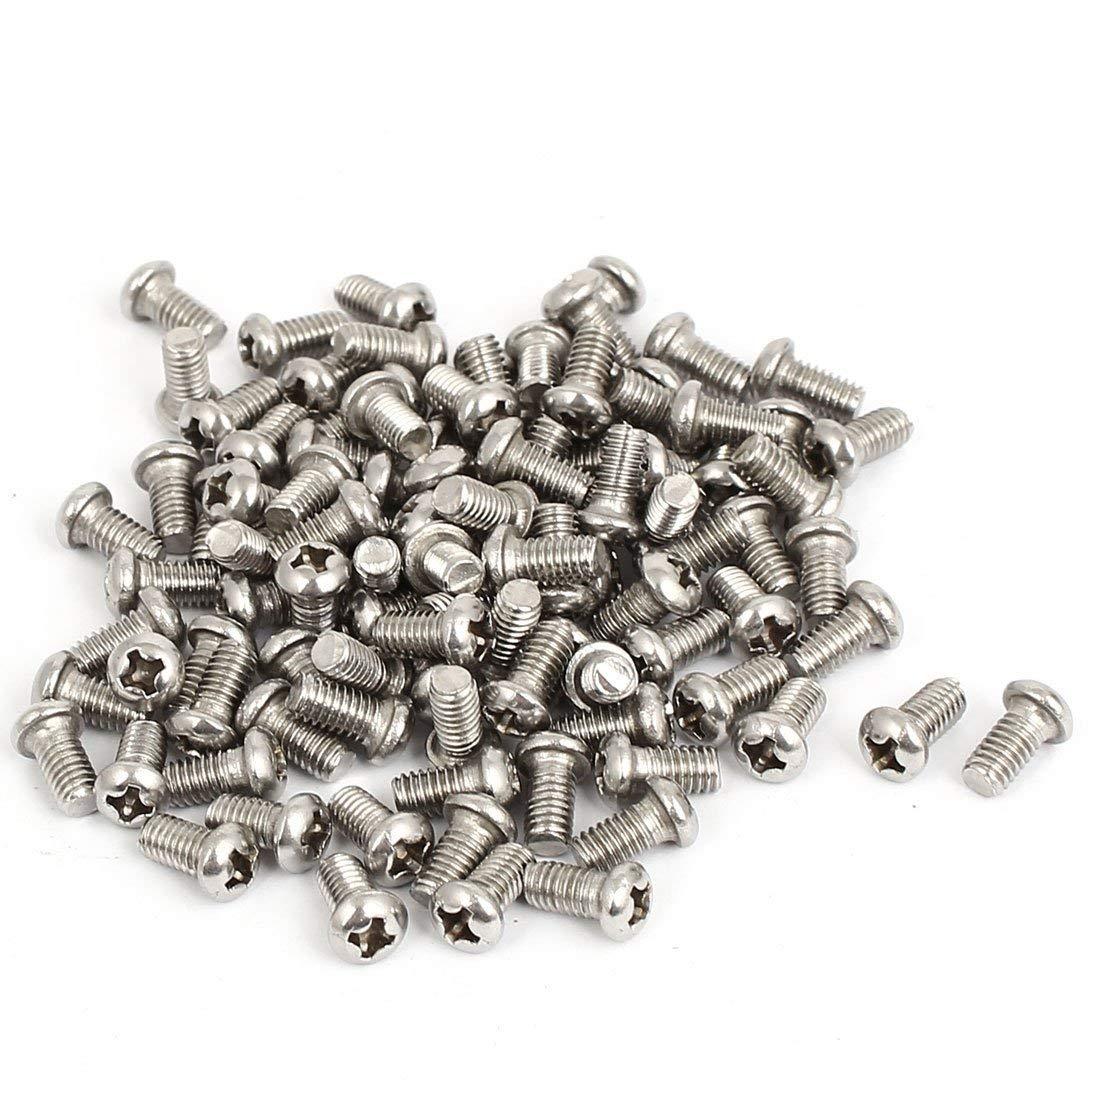 304 Stainless Steel Phillips Round Pan Head Machine Screws M2X5MM(100pcs)